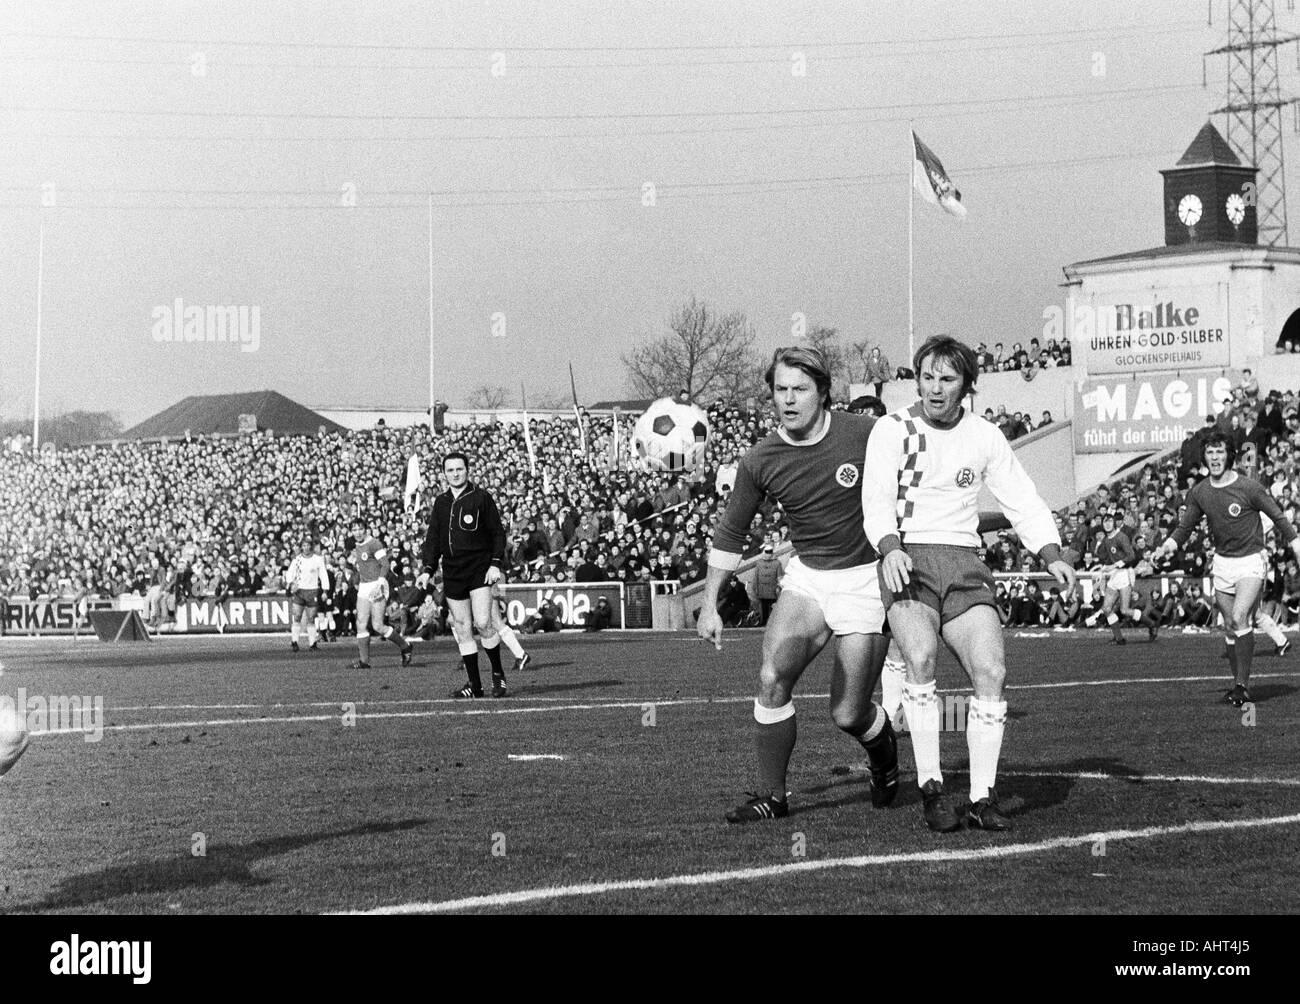 football, Bundesliga, 1970/1971, Niederrhein Stadium, Rot-Weiss Oberhausen versus Rot-Weiss Essen 0:0, scene of the match, f.l.t.r. referee Alfons Betz from Regensburg, Lothar Kobluhn (RWO), Wolfgang Rausch (RWE), Wolfgang Suehnholz (RWO) - Stock Image